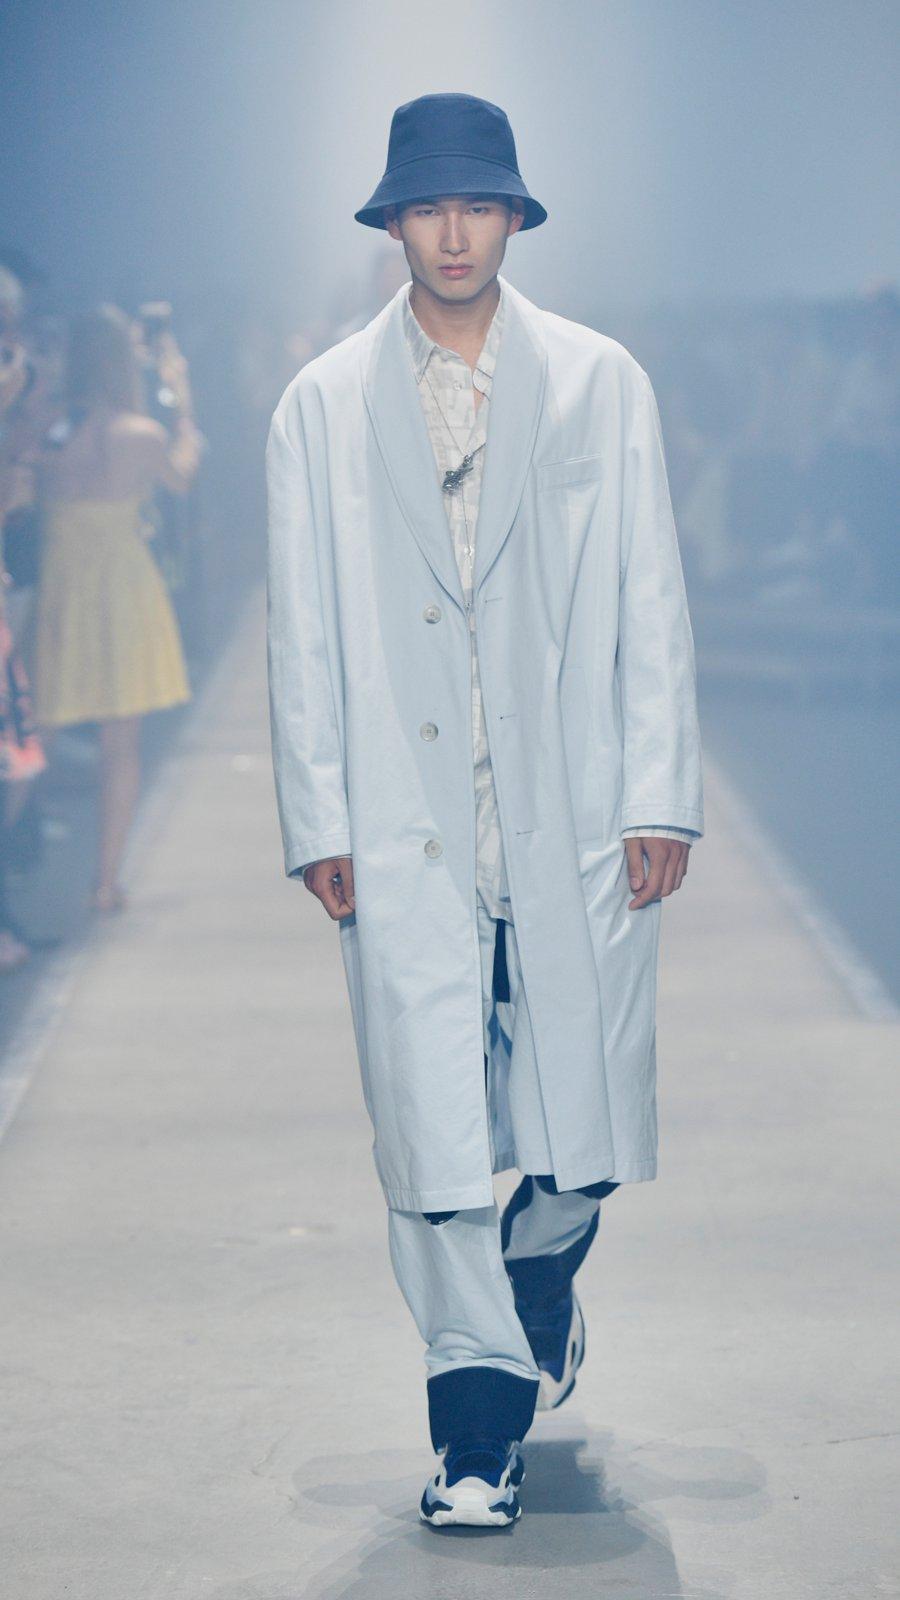 Spring/Summer 19 Fashion Show